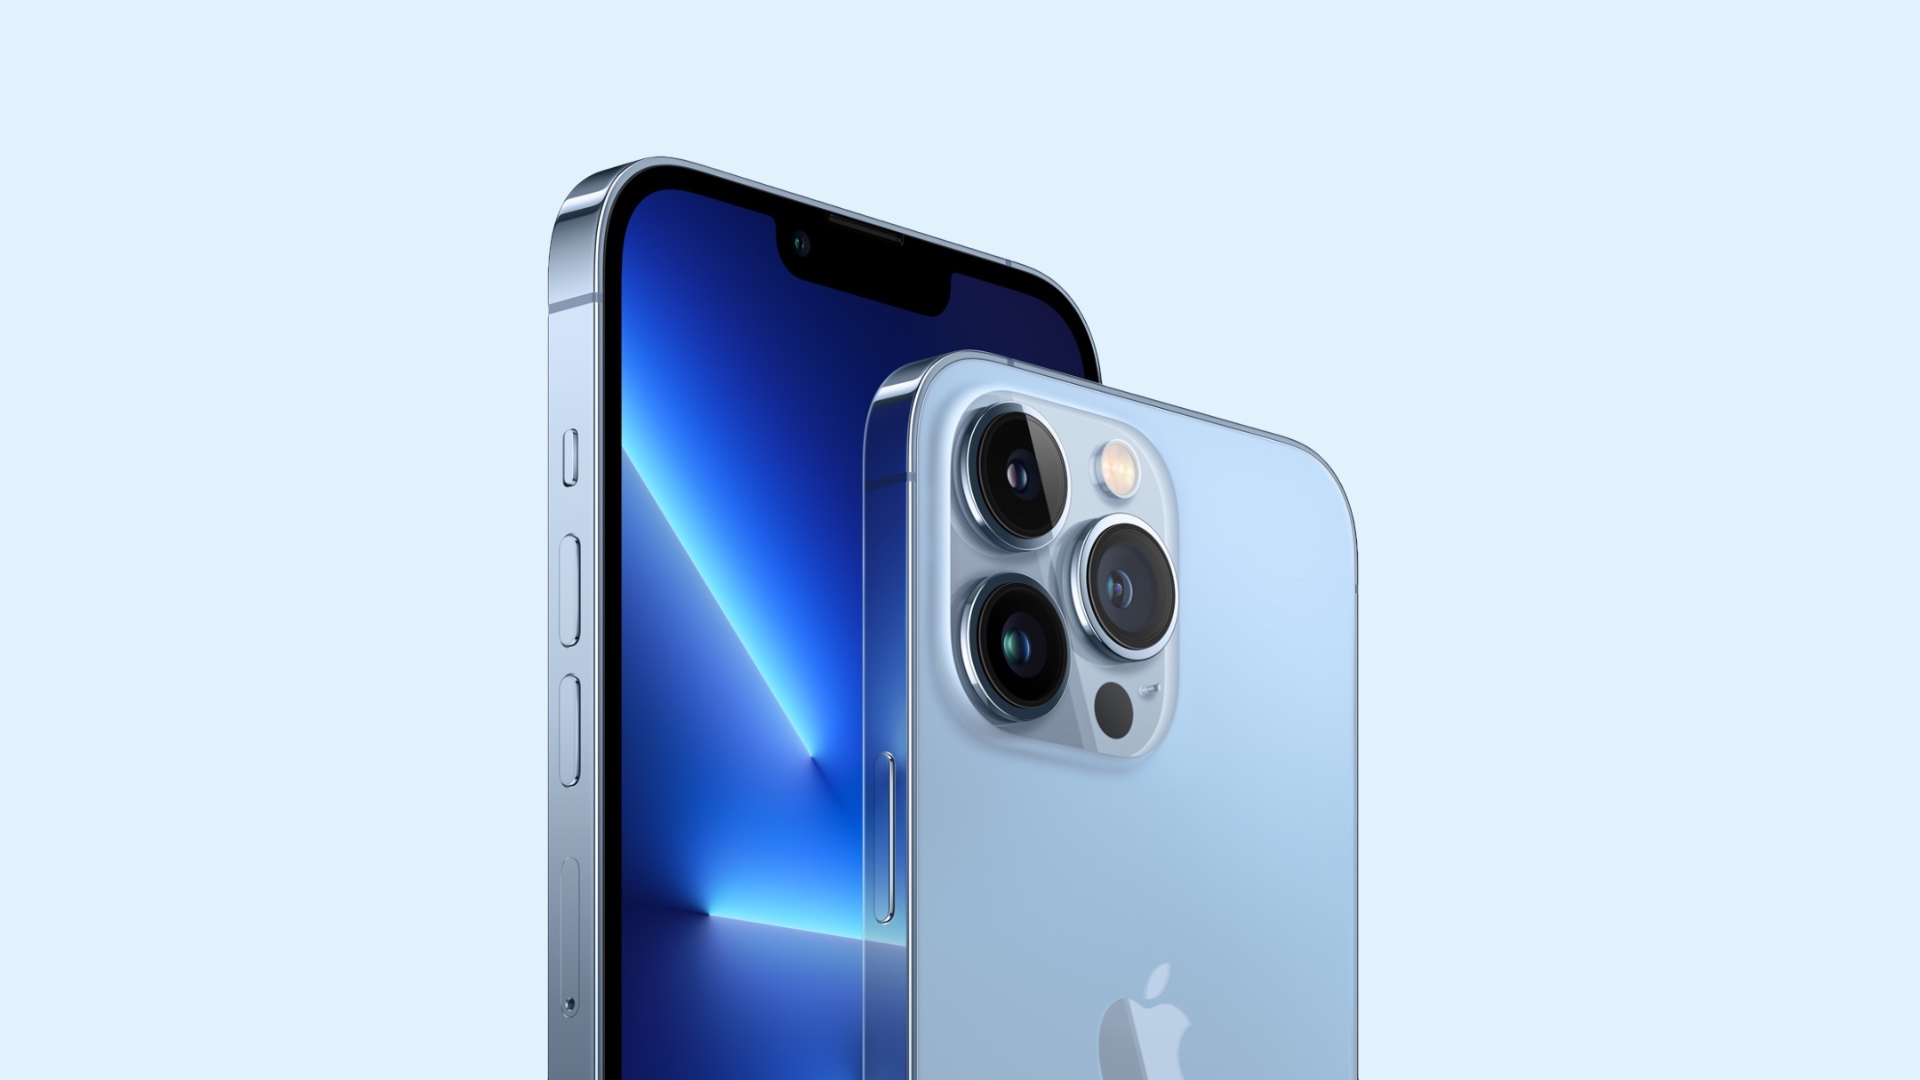 iphone-13-pro-header-9to5mac